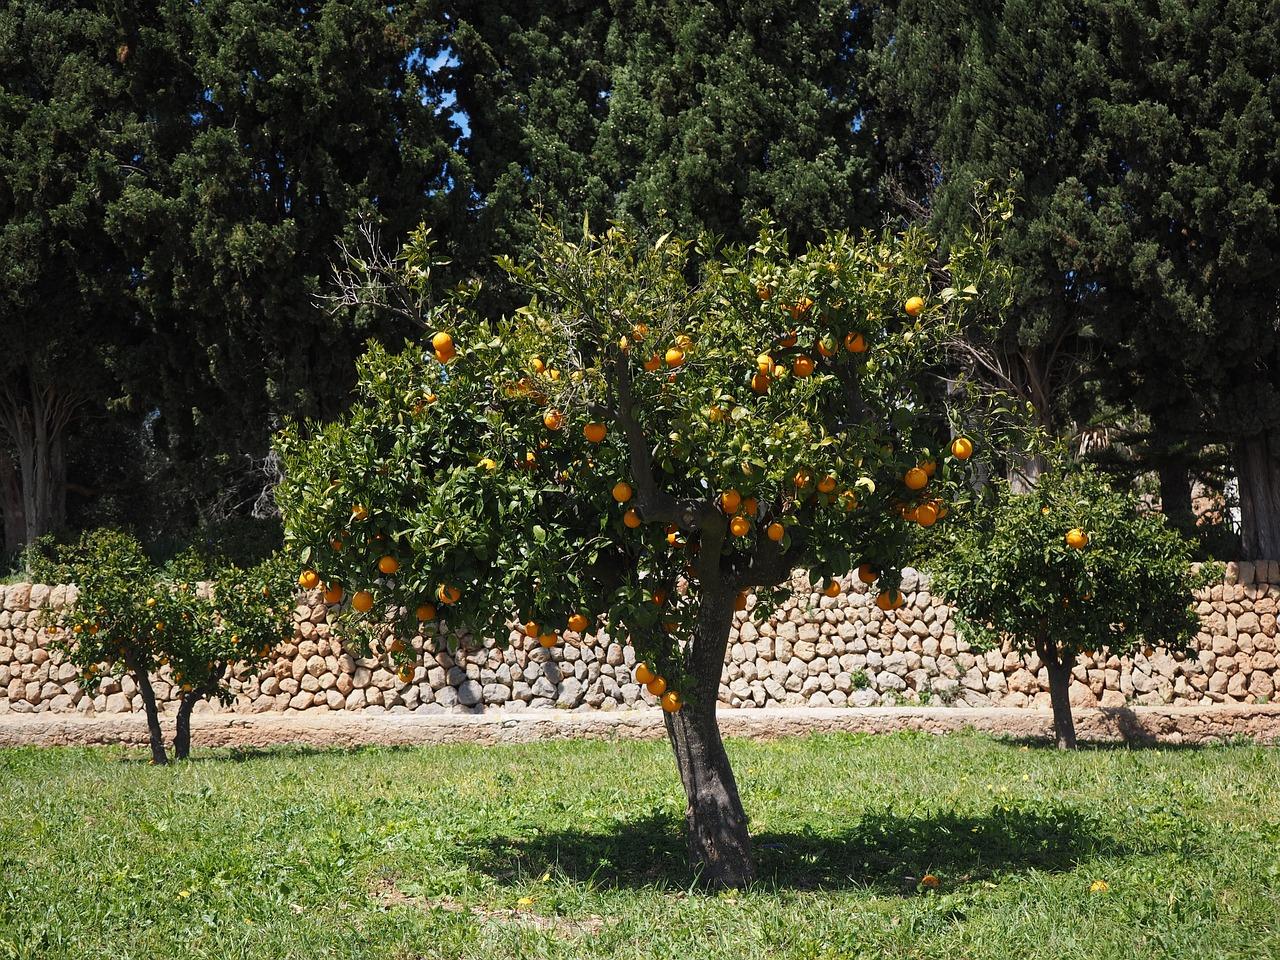 Supreme Court takes up California farmworkers union case